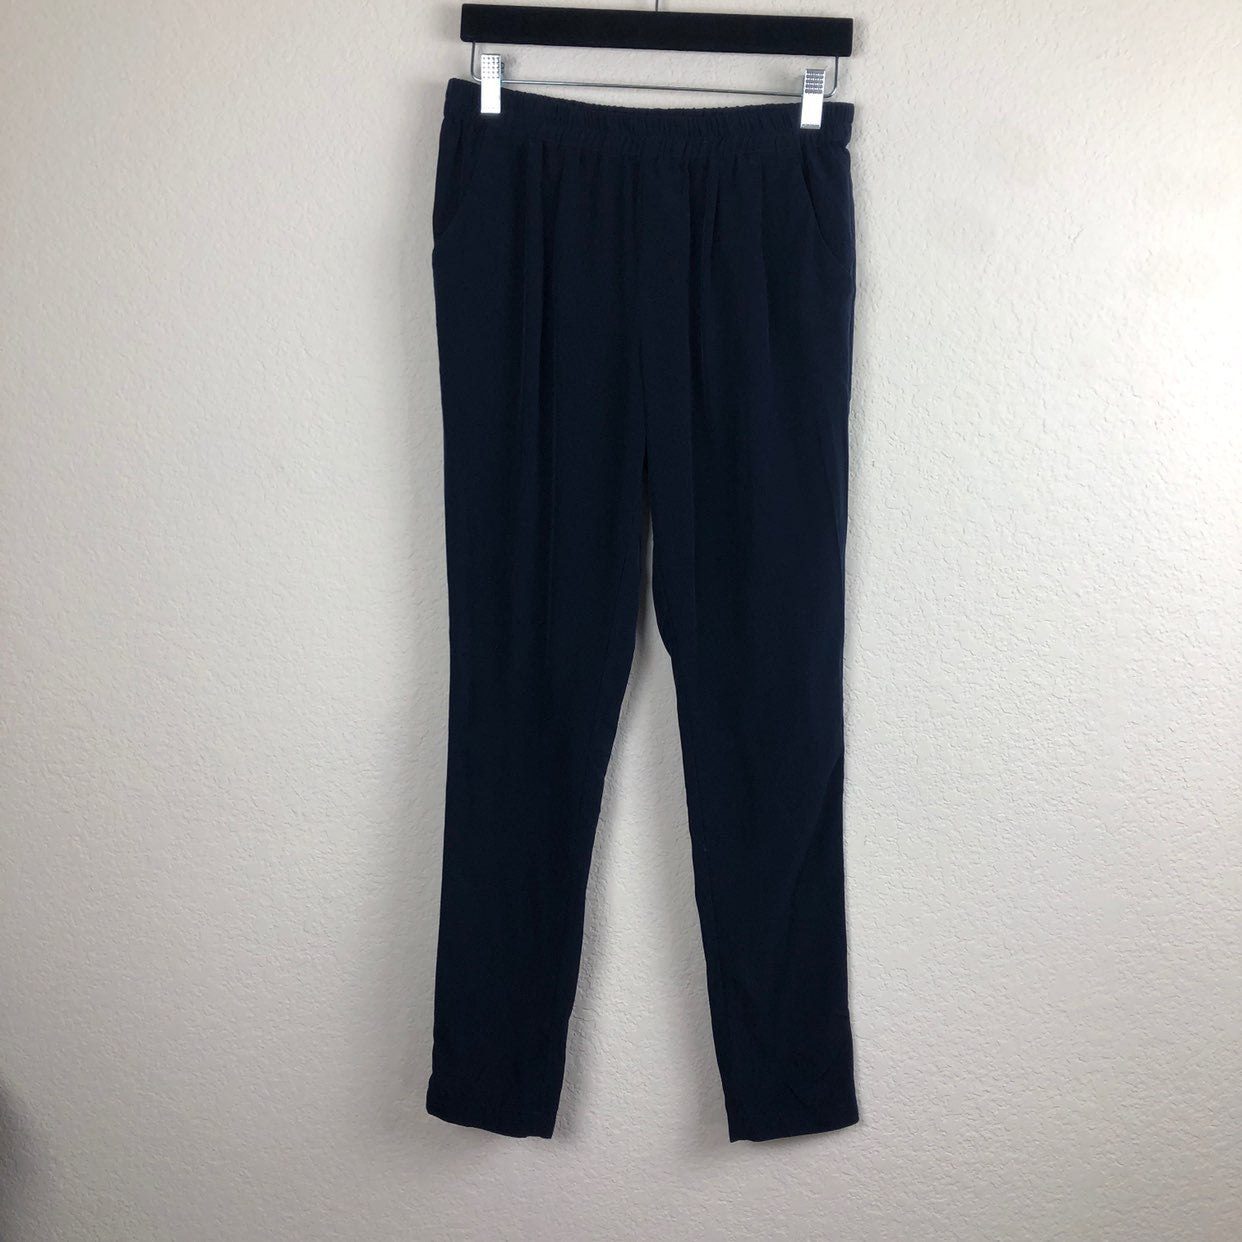 Merona Blue Ankle Length pants XS